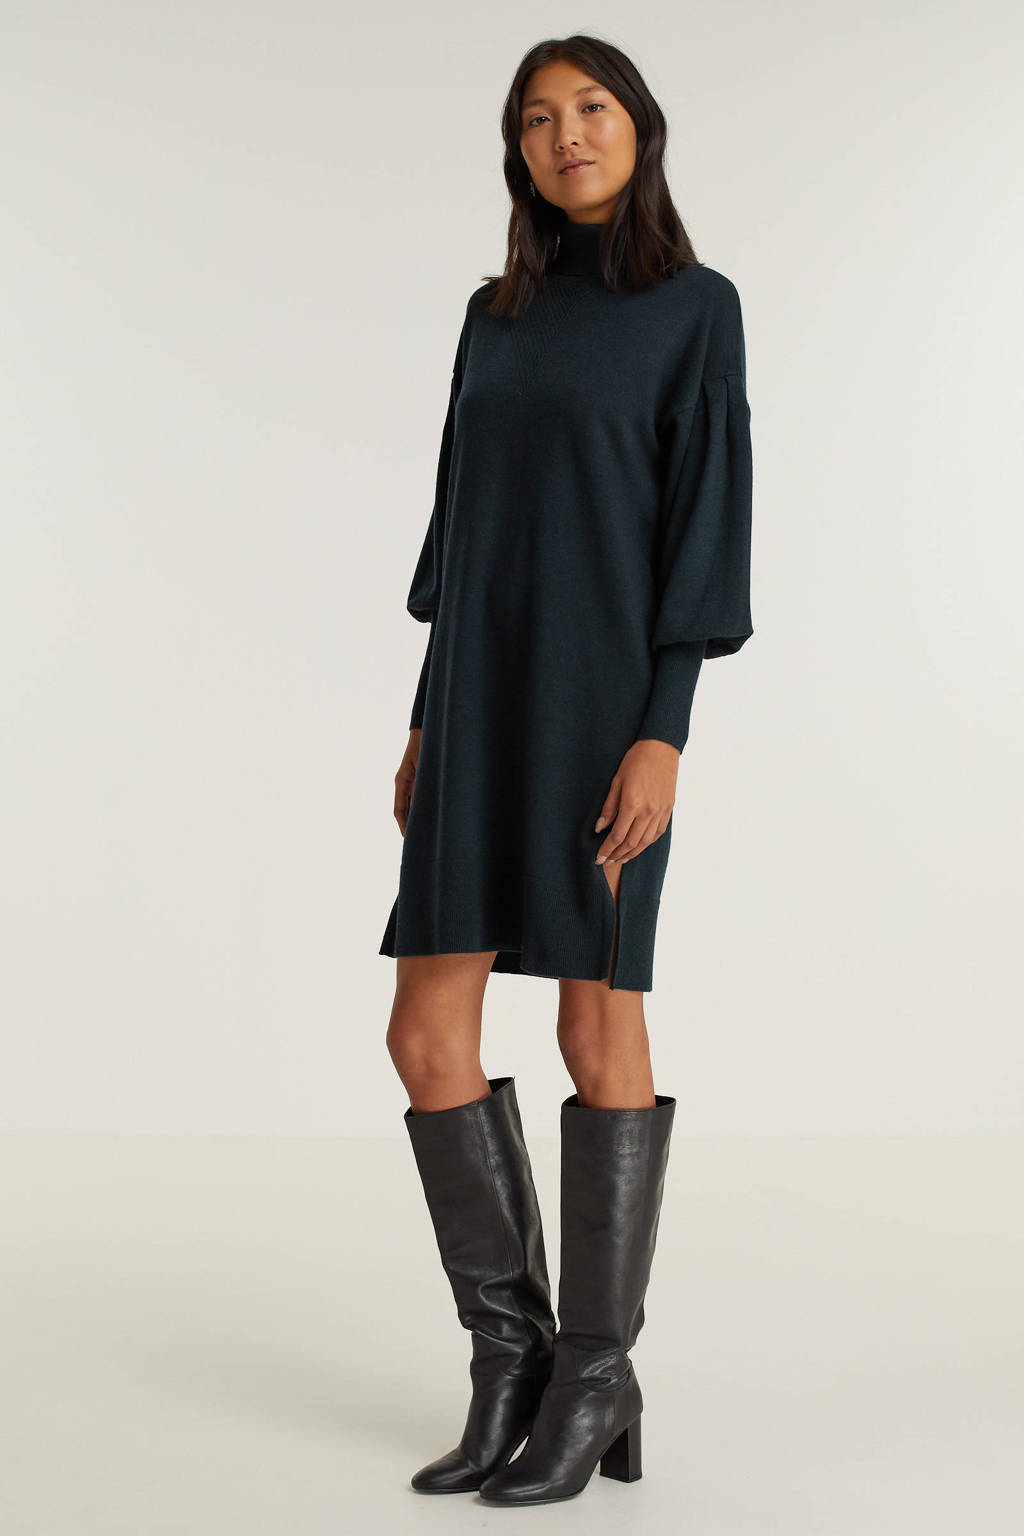 FREEQUENT fijngebreide jurk FQFAULA zwart, Donkergroen